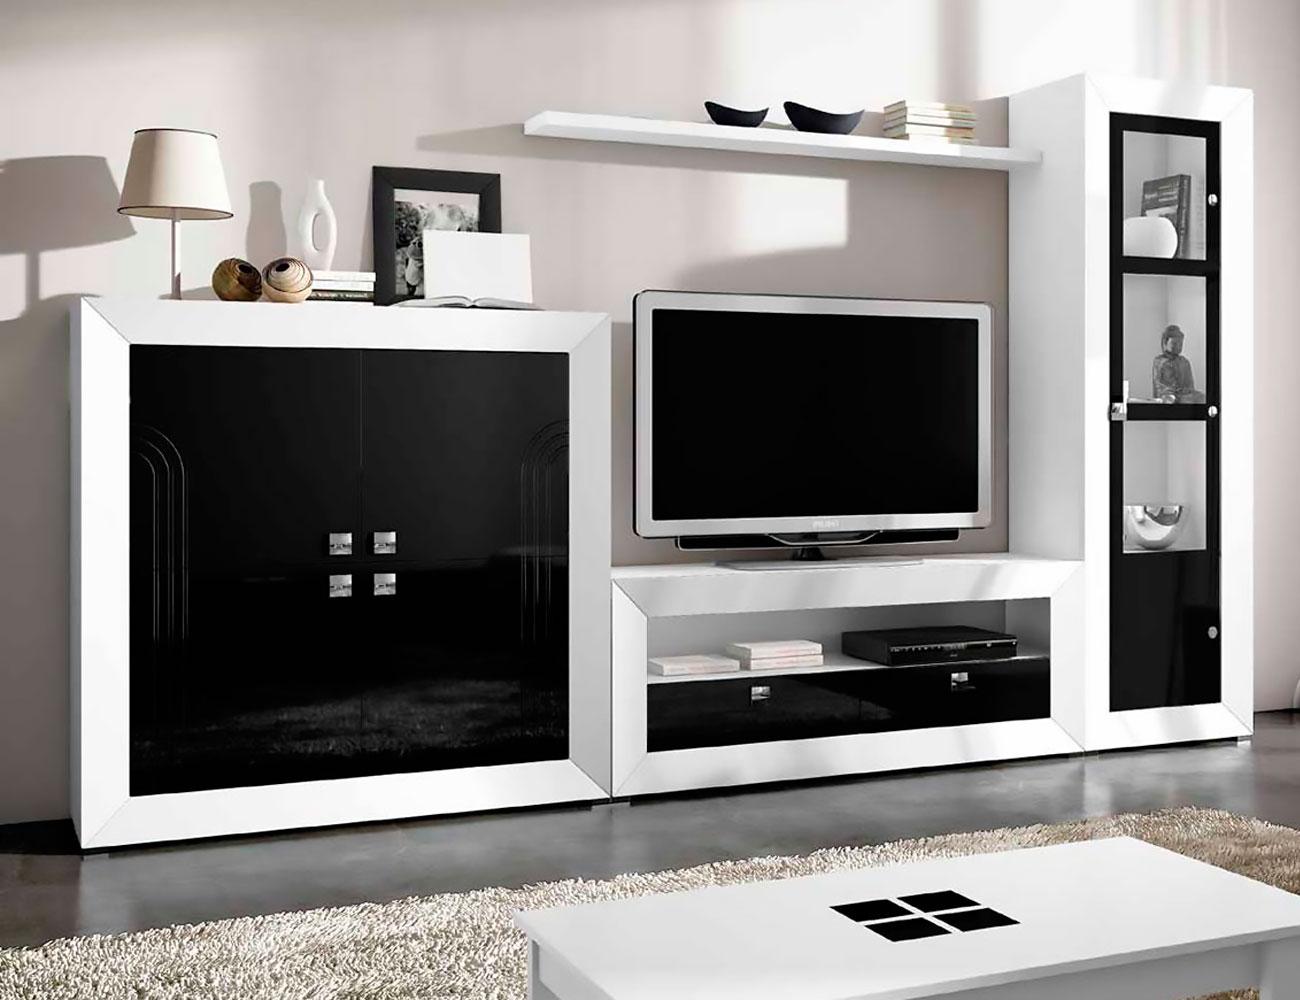 Mueble salon moderno 062